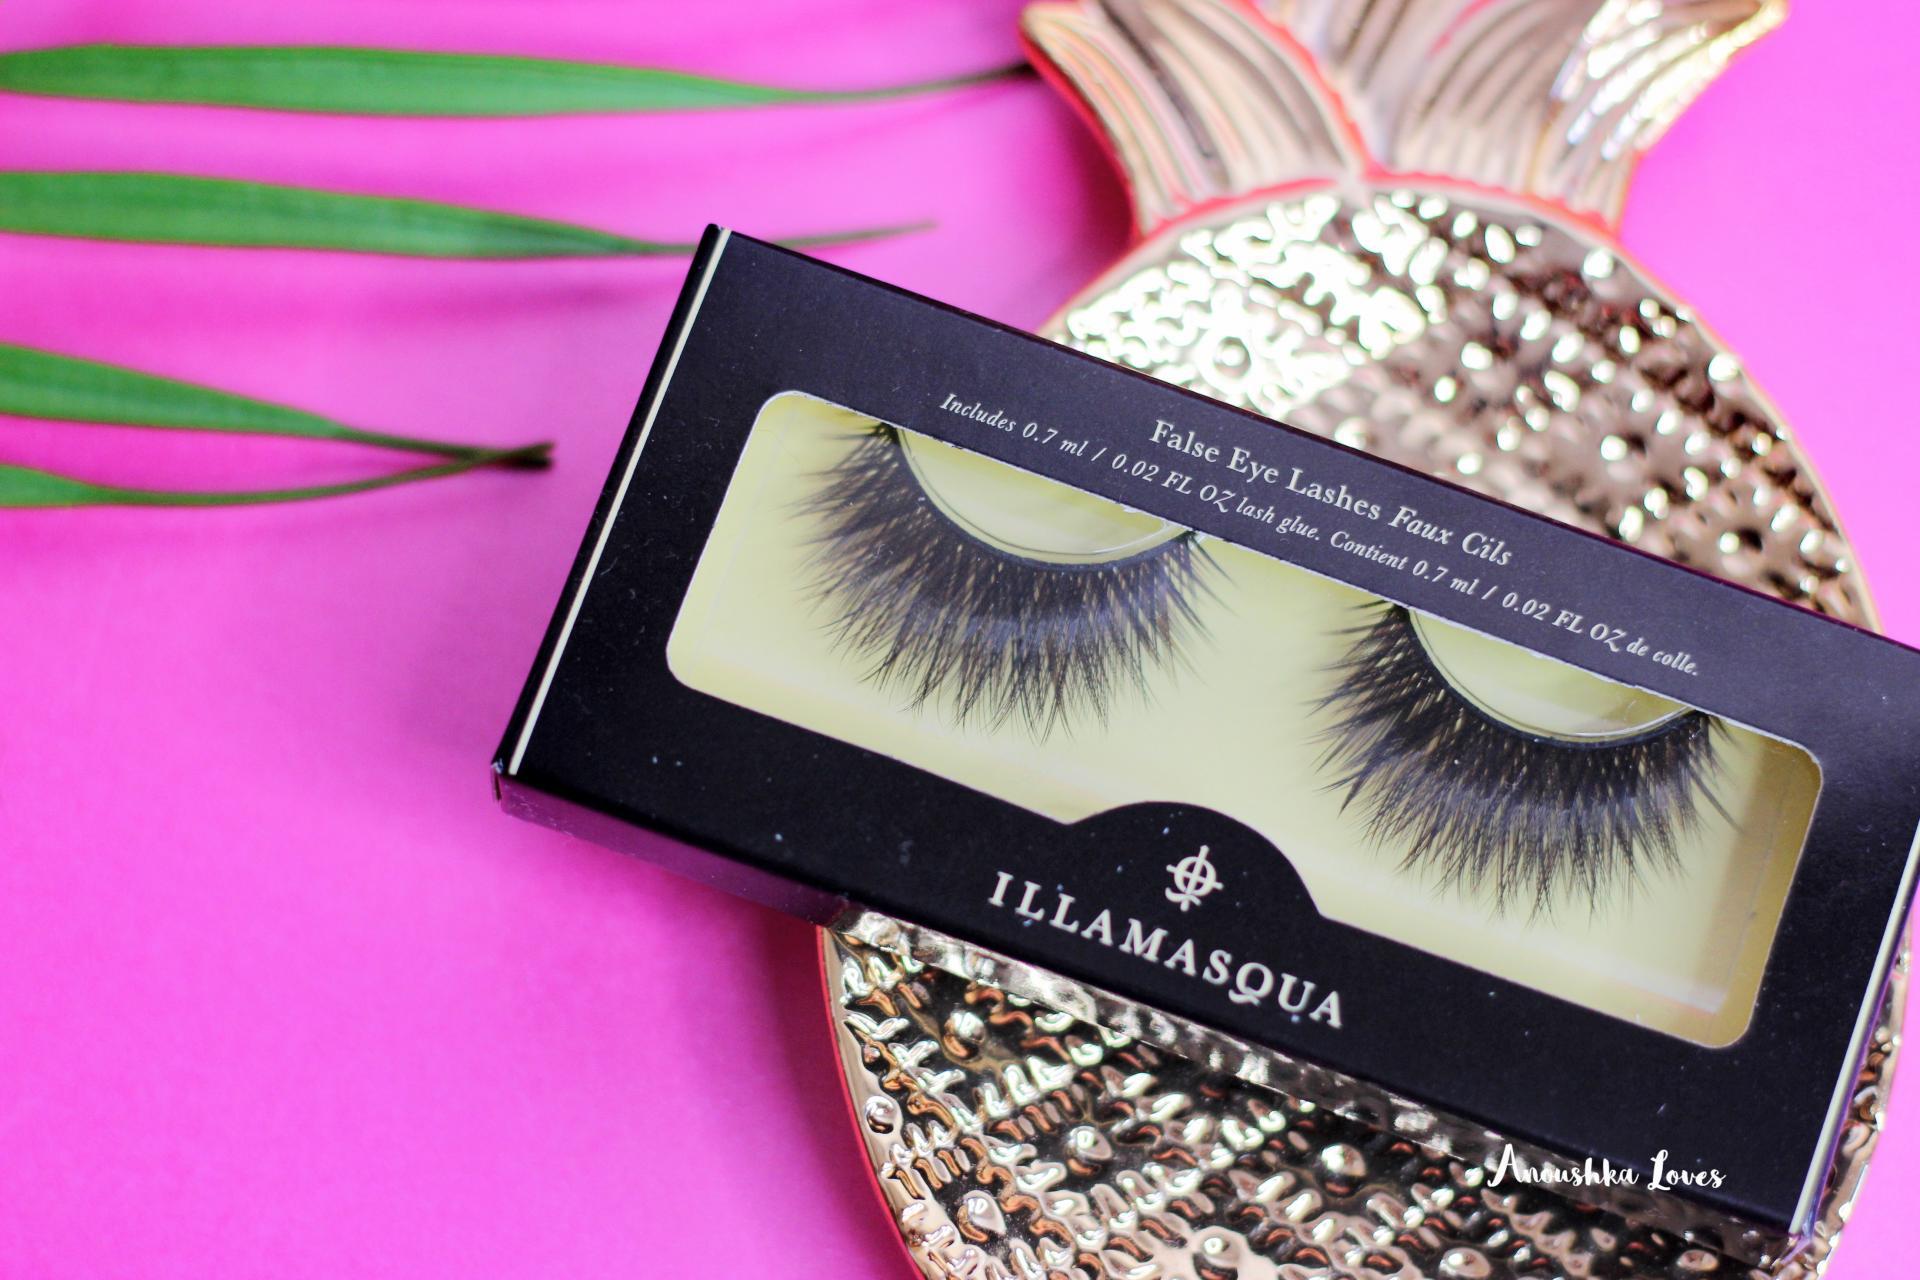 Illamasqua Visage lashes